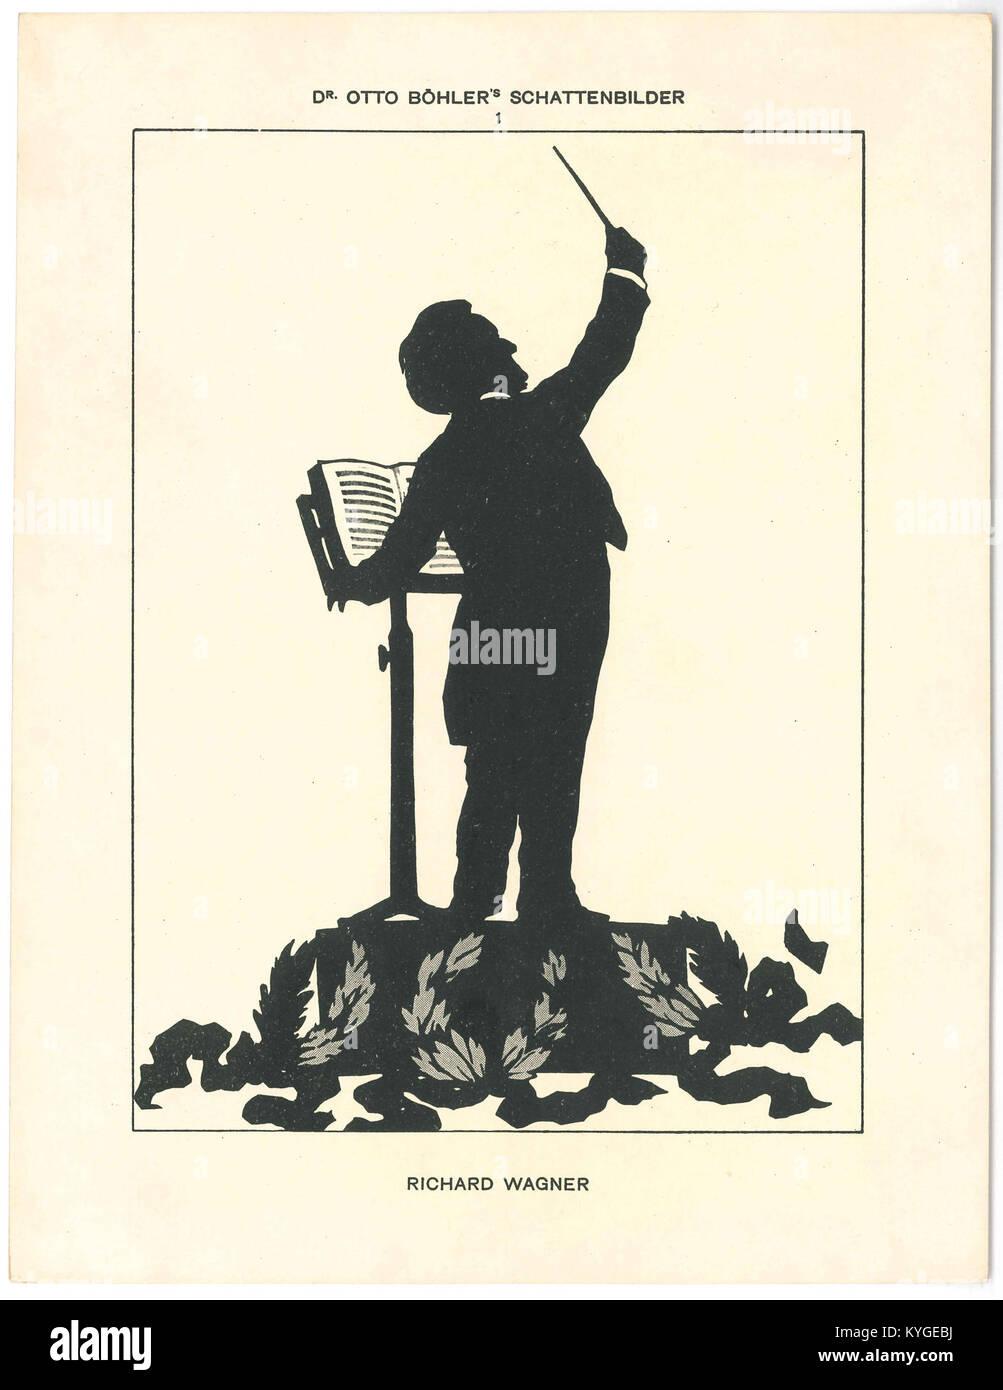 Brahms in heaven Bohler Silhouette Vintage Classical Music Poster